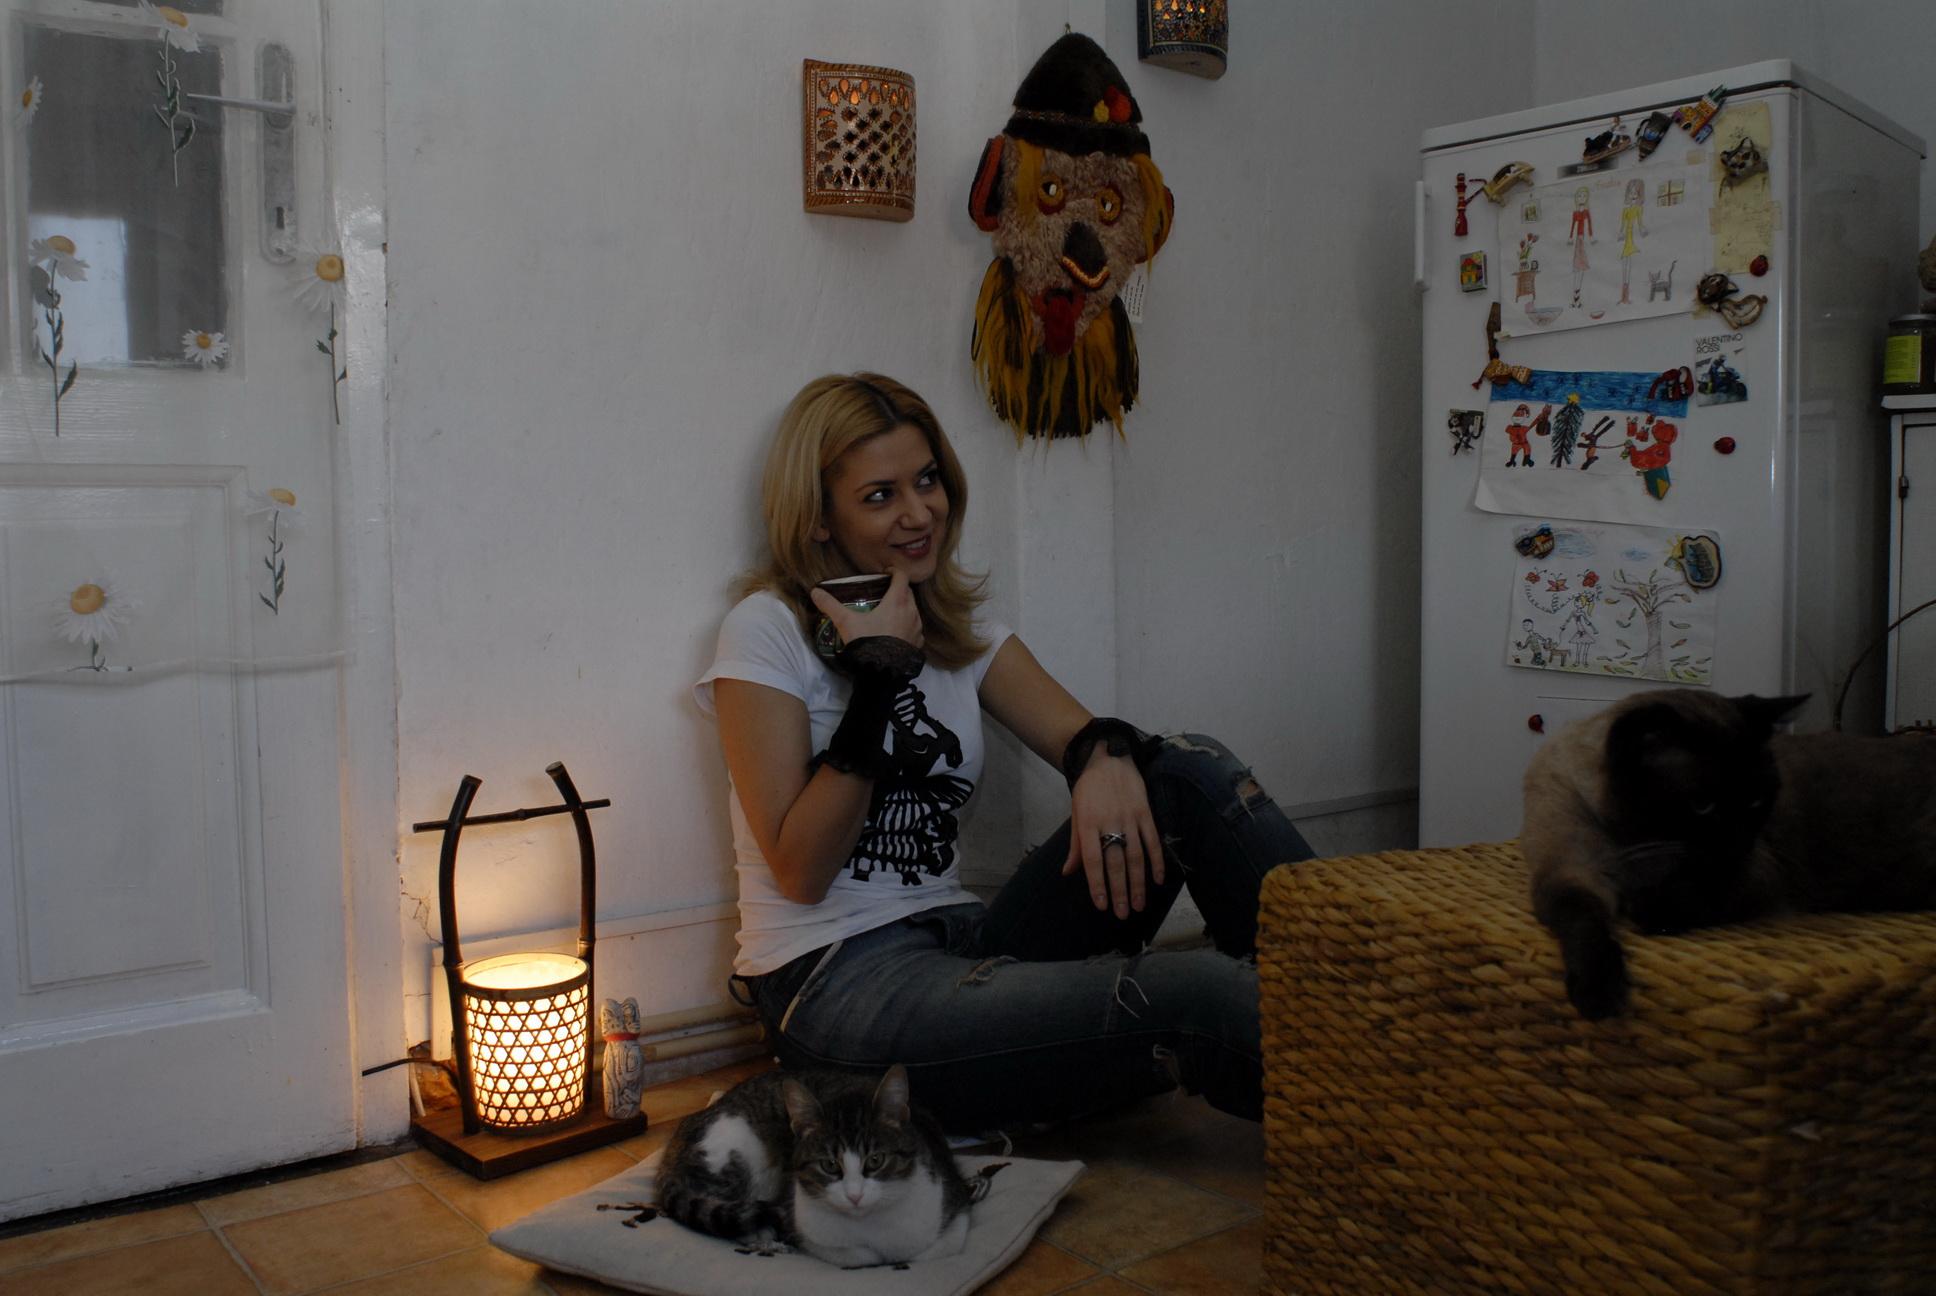 foto Petrut Calinescu (2)_resize